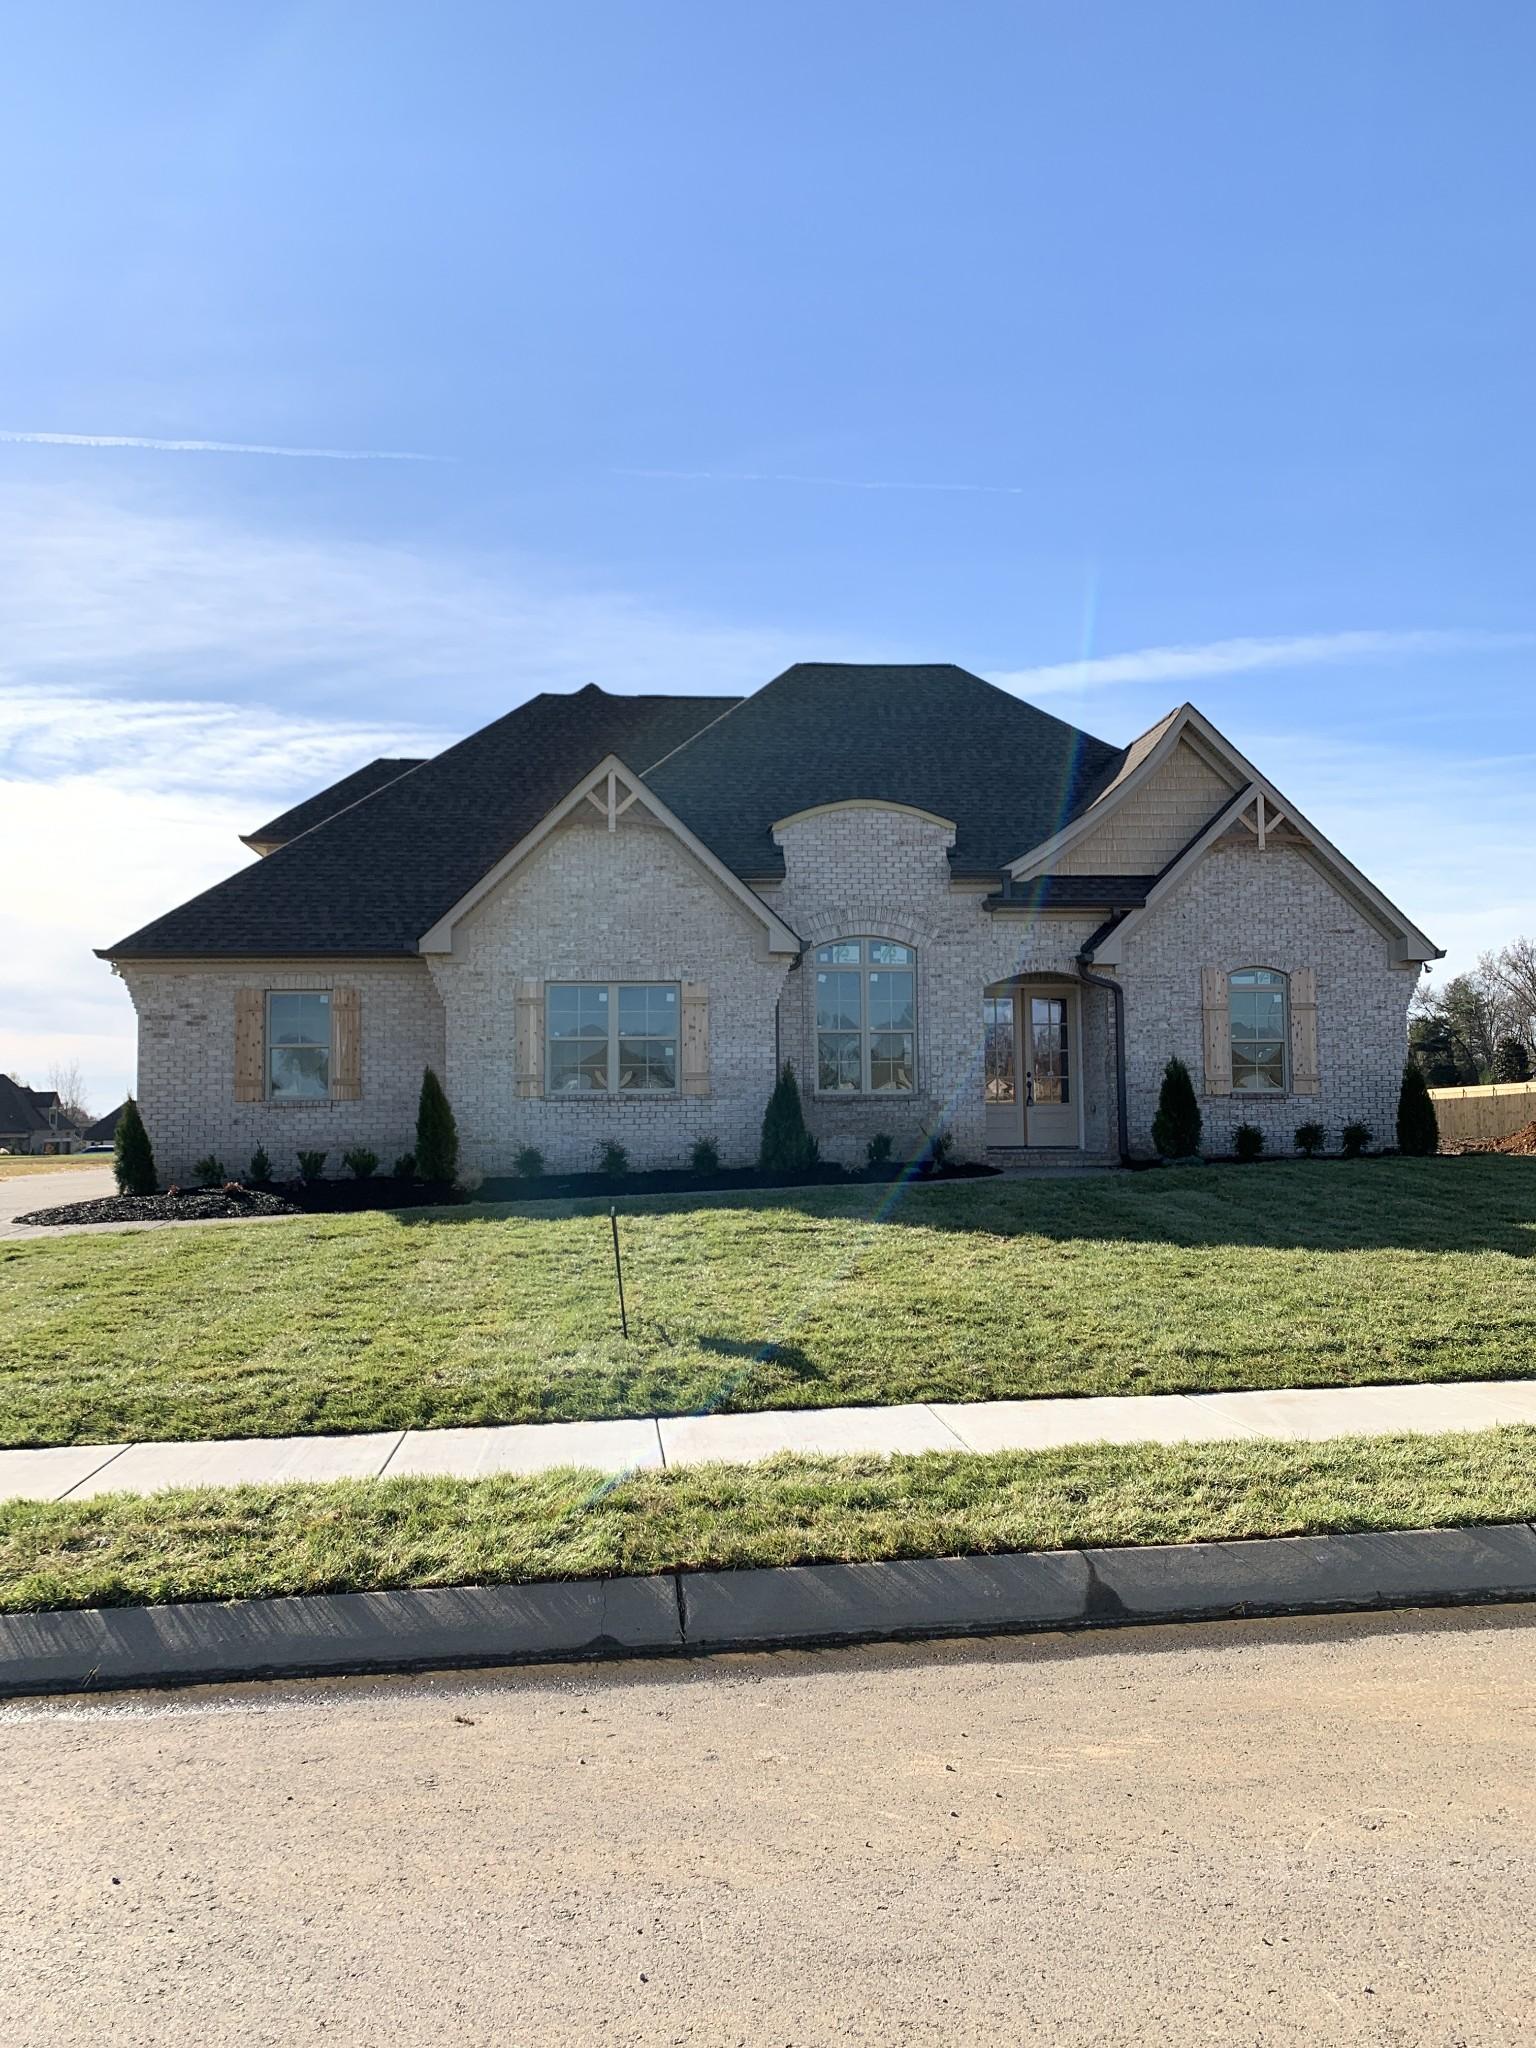 974 Westbrook Dr, Gallatin, TN 37066 - Gallatin, TN real estate listing